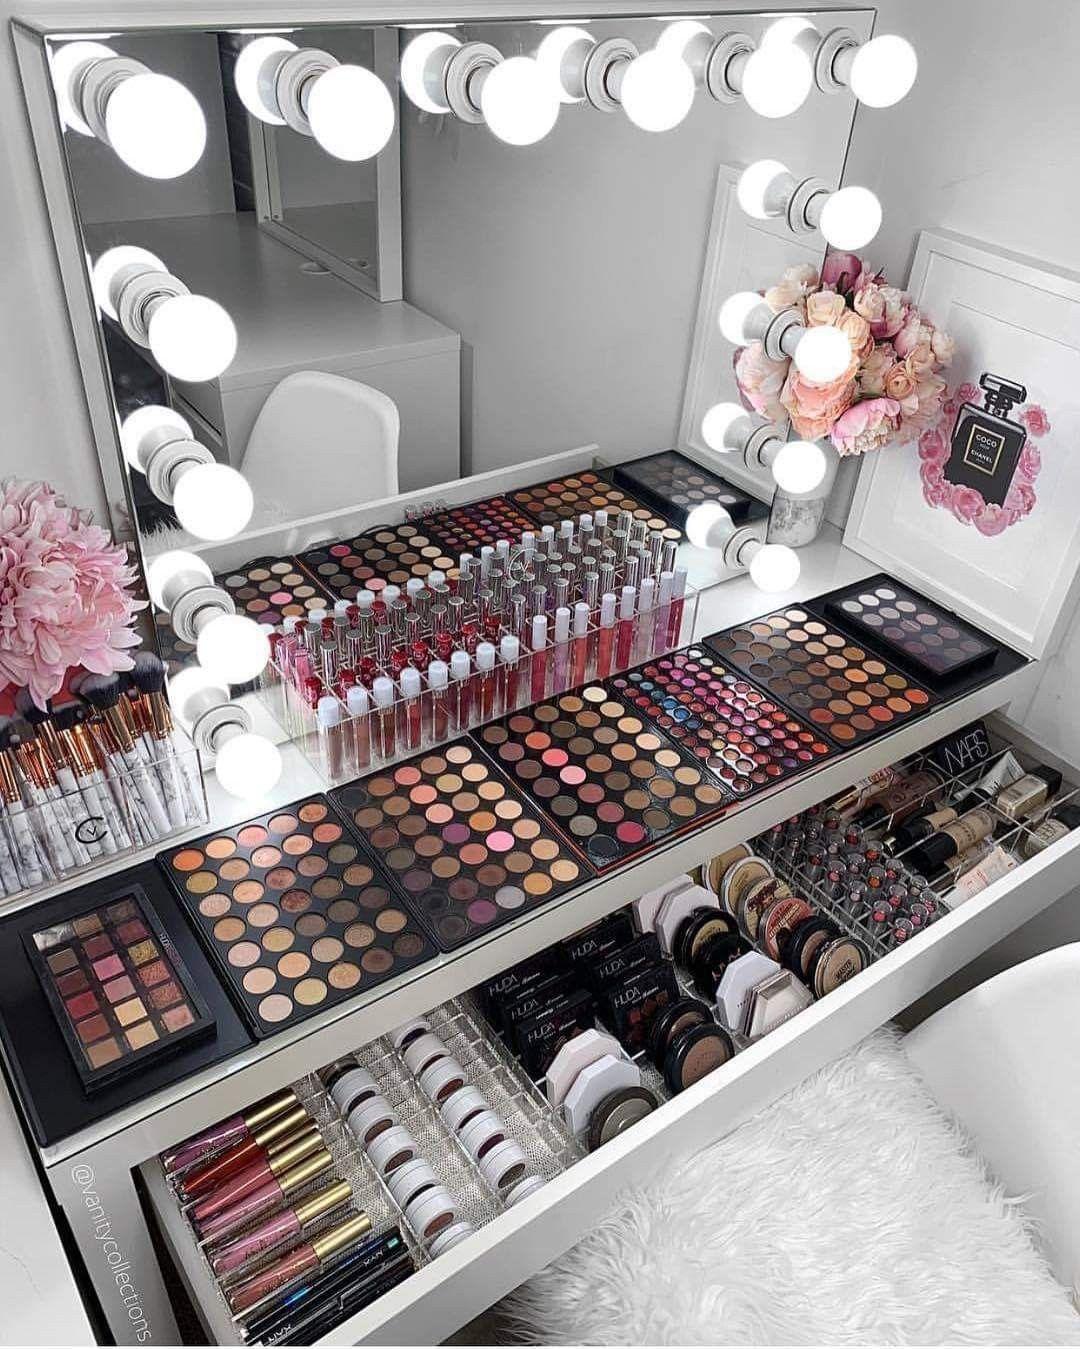 Makeup goals! #makeupgoals